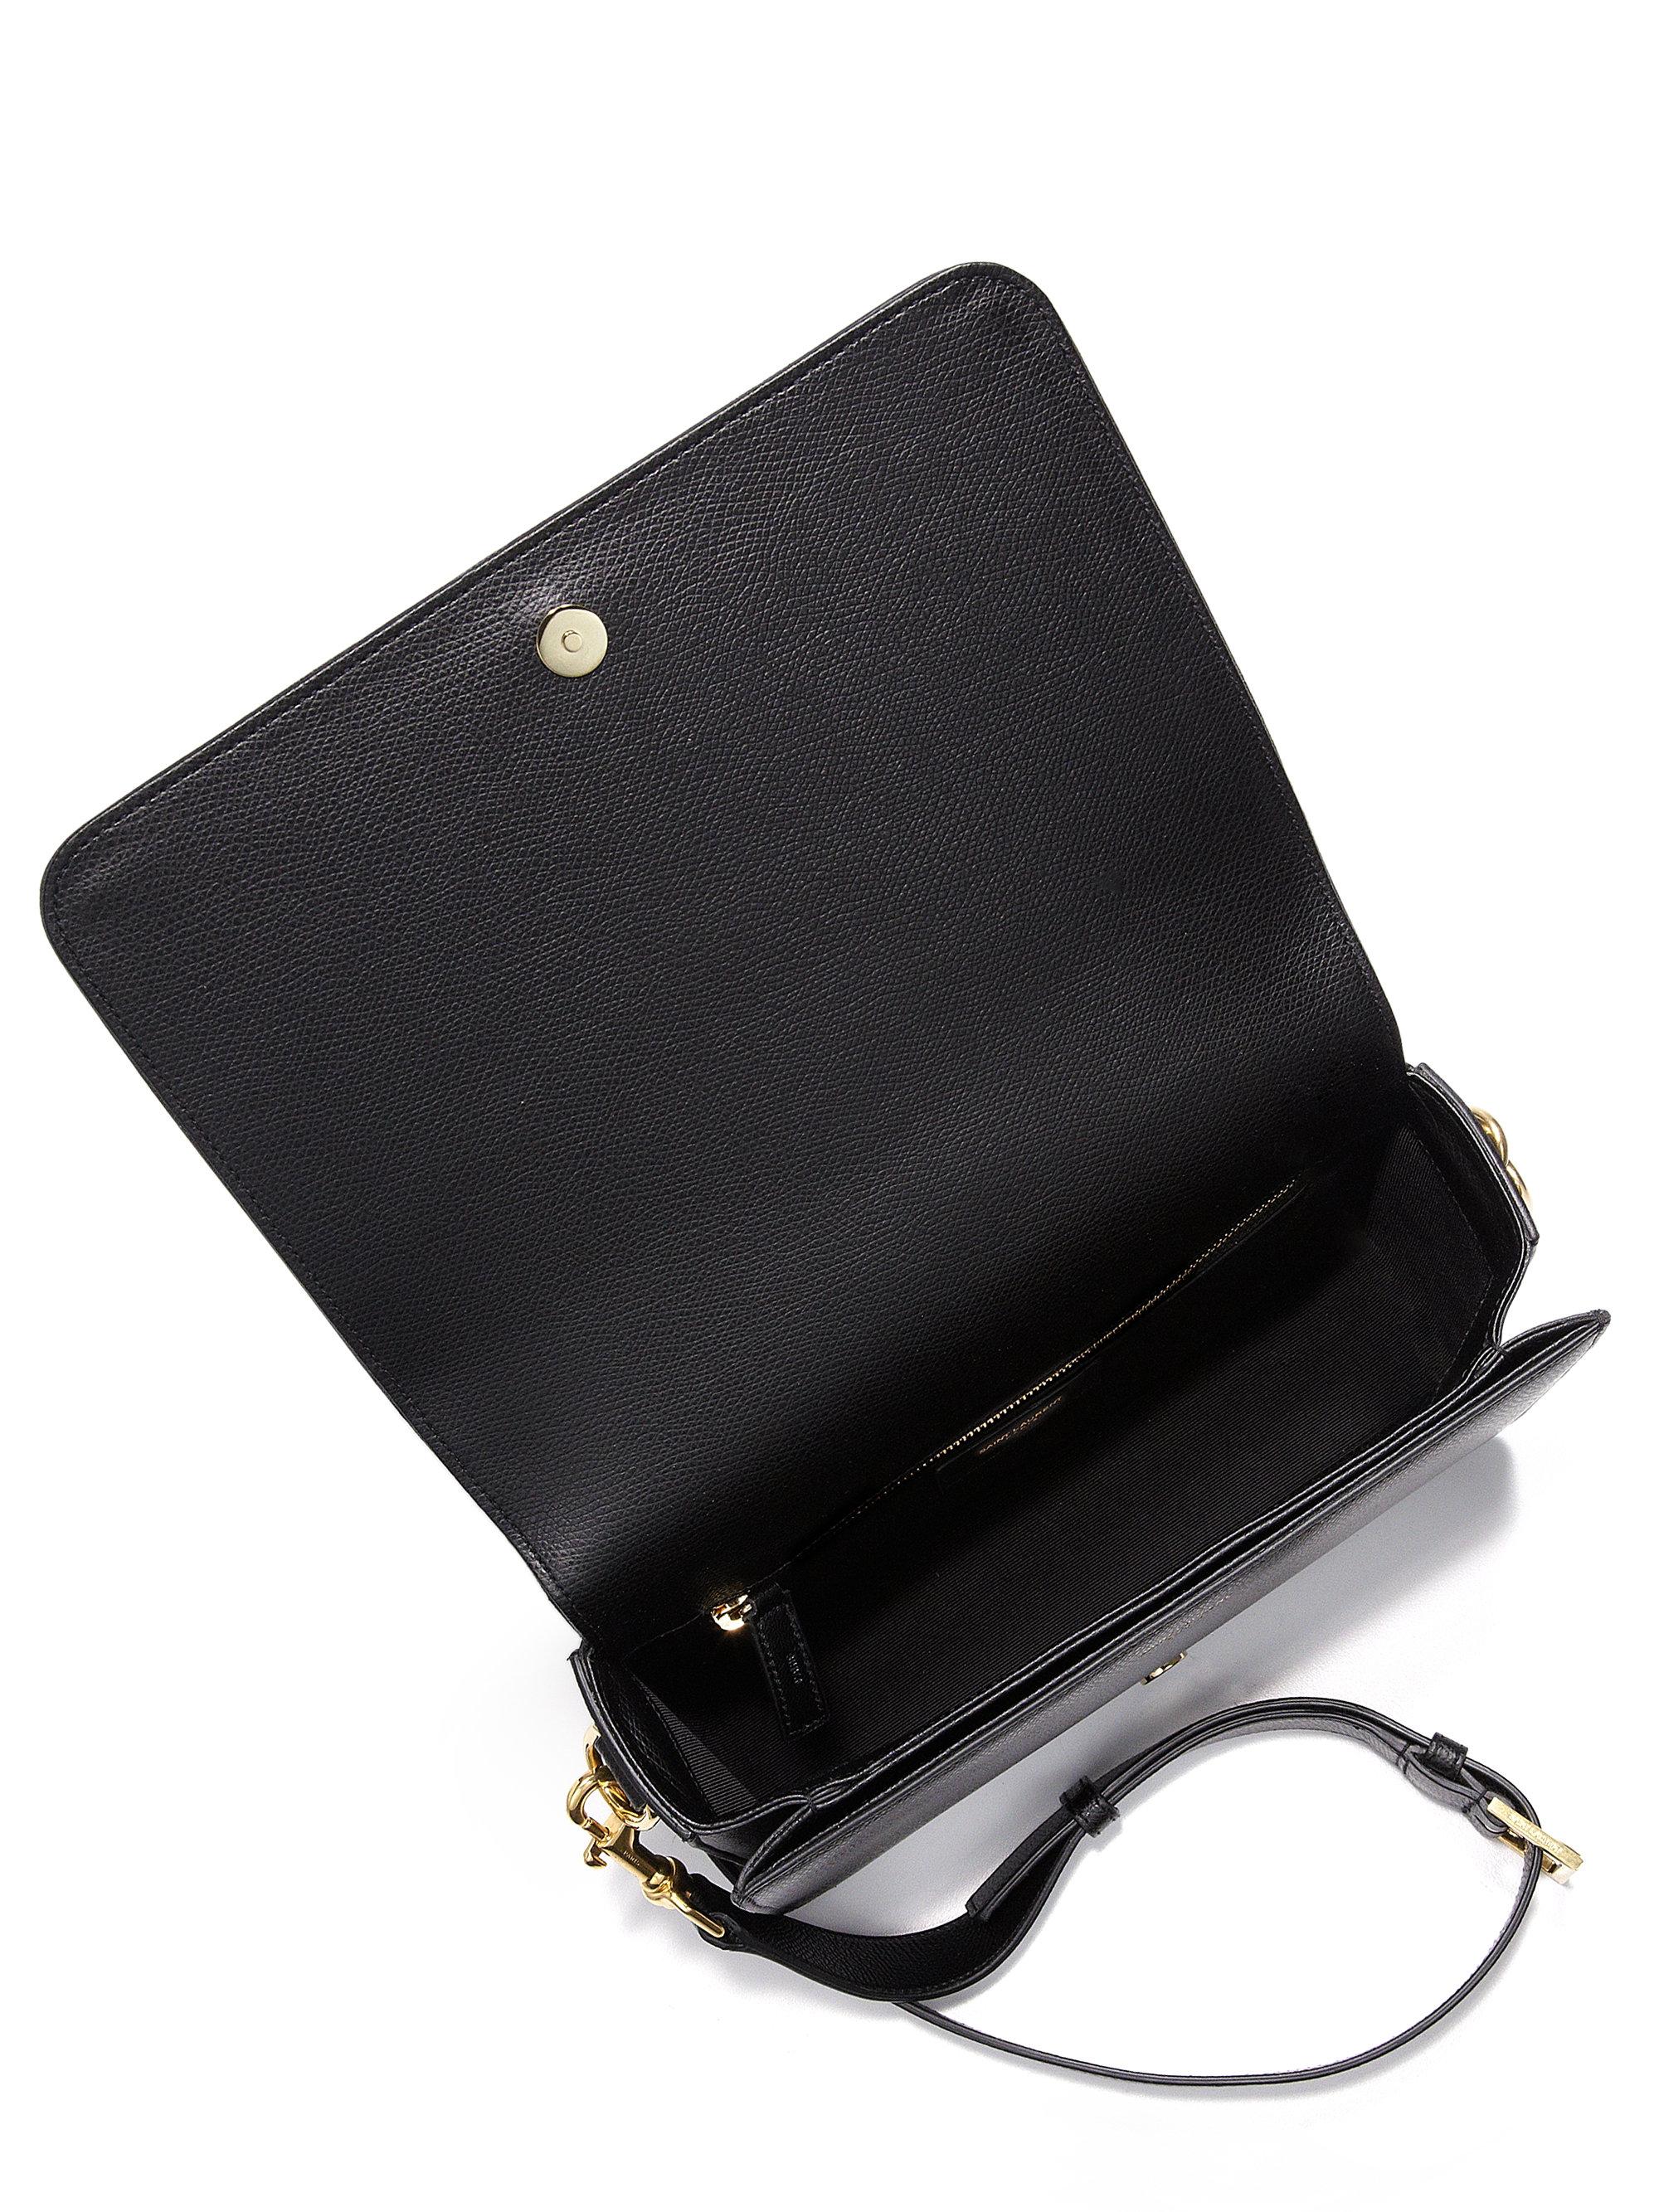 Monogram small universite satchel bag black new ysl handbags for Porte carte ysl